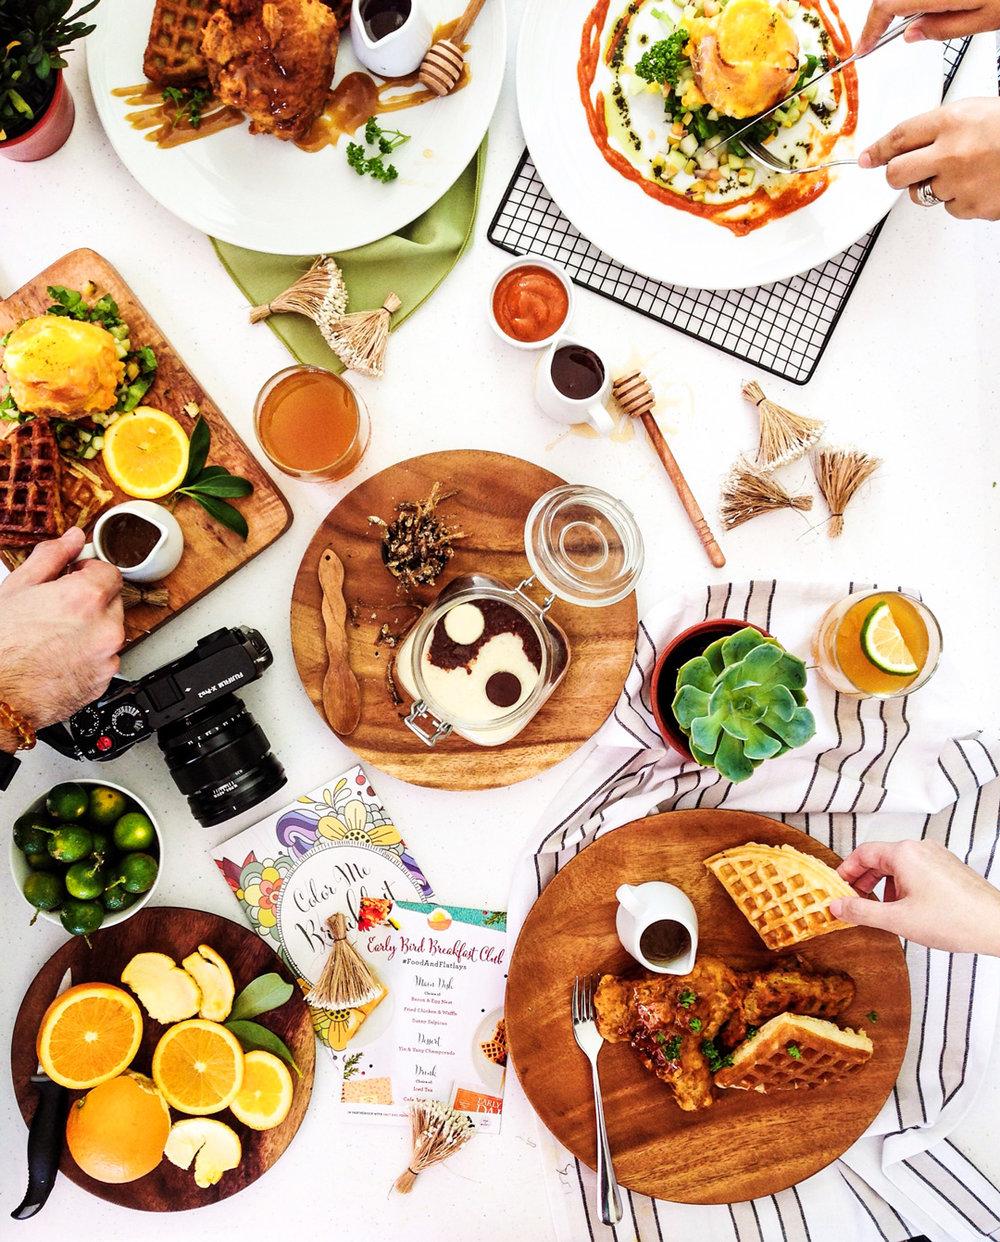 Make It Blissful • Food & Flatlay